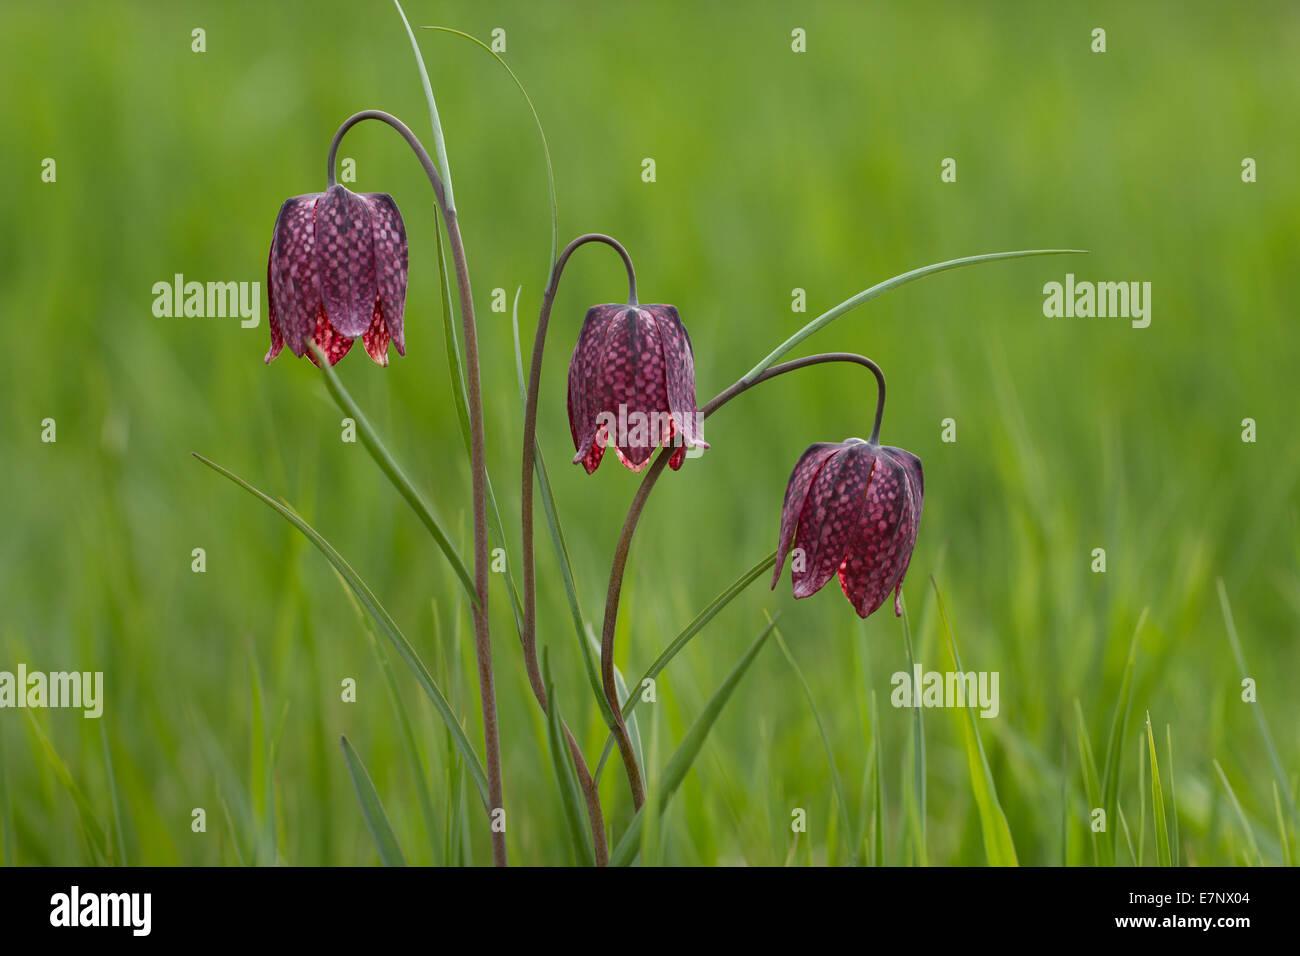 Nature, Flower, fritillary, snake's head guinea-hen flower, chess flower, Plantae, Liliales, Fritillaria meleagris, Stock Photo